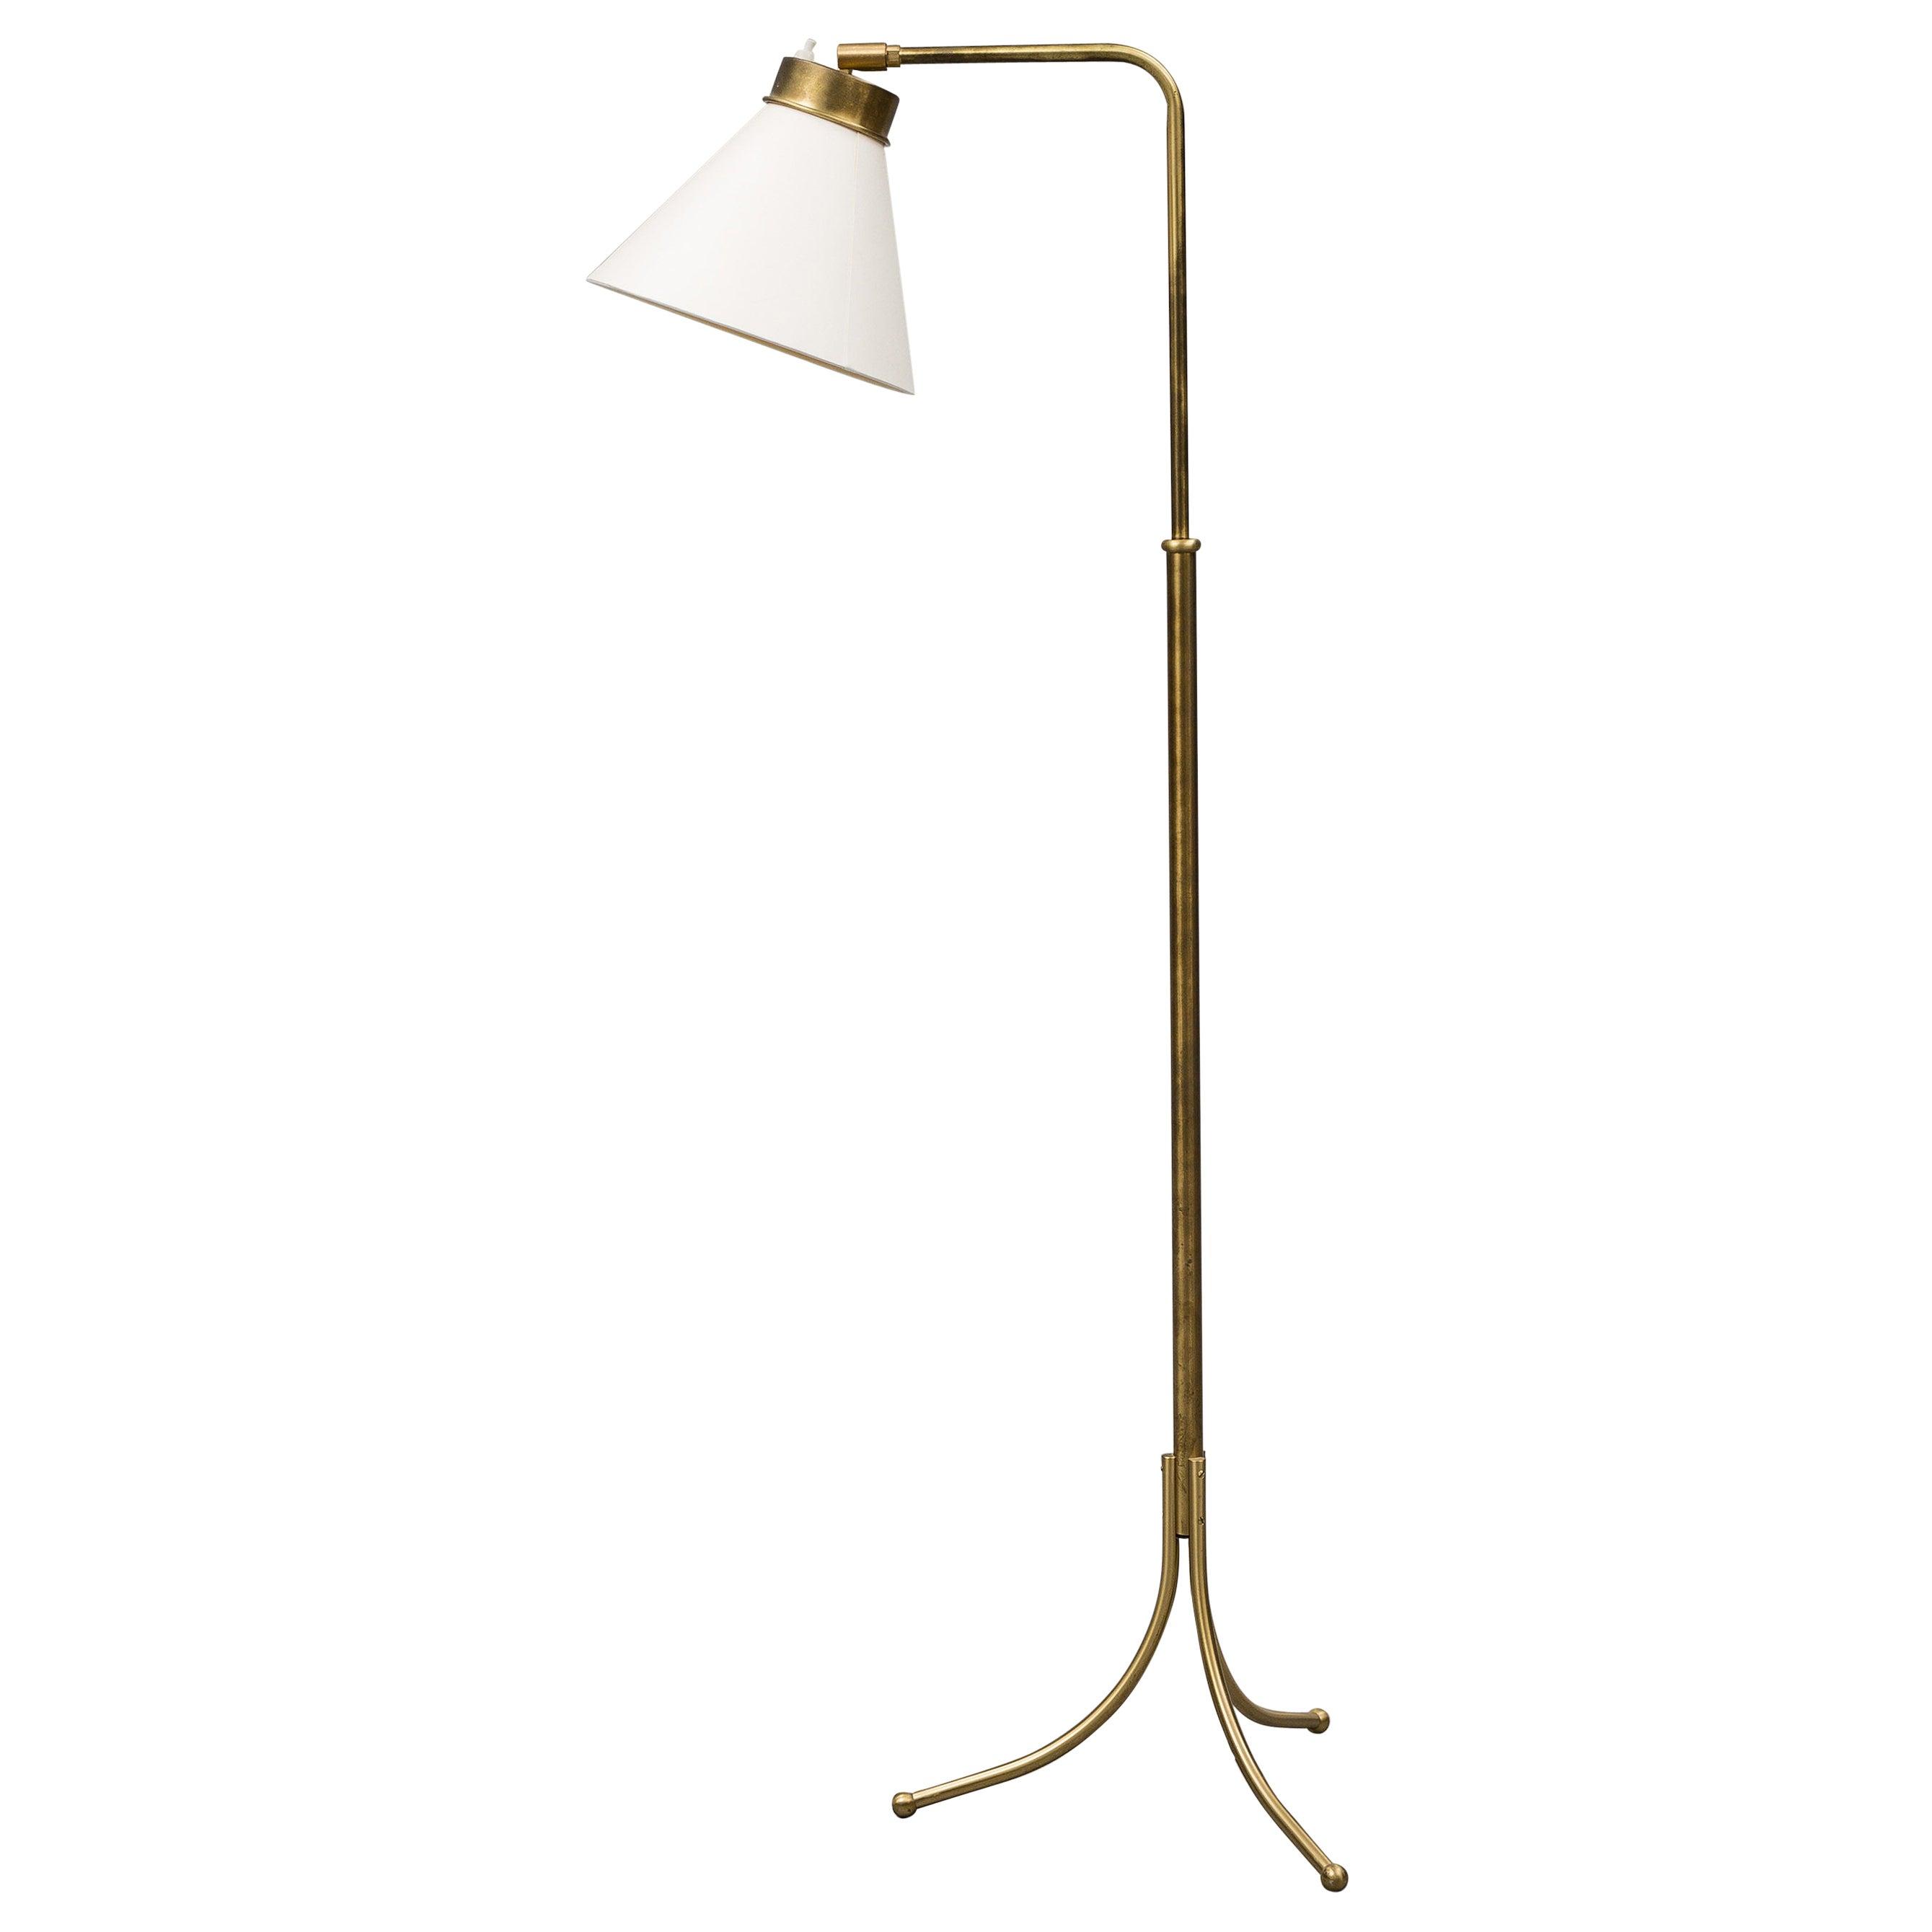 Josef Frank Designed 1842 Floor Lamp by Svenskt Tenn